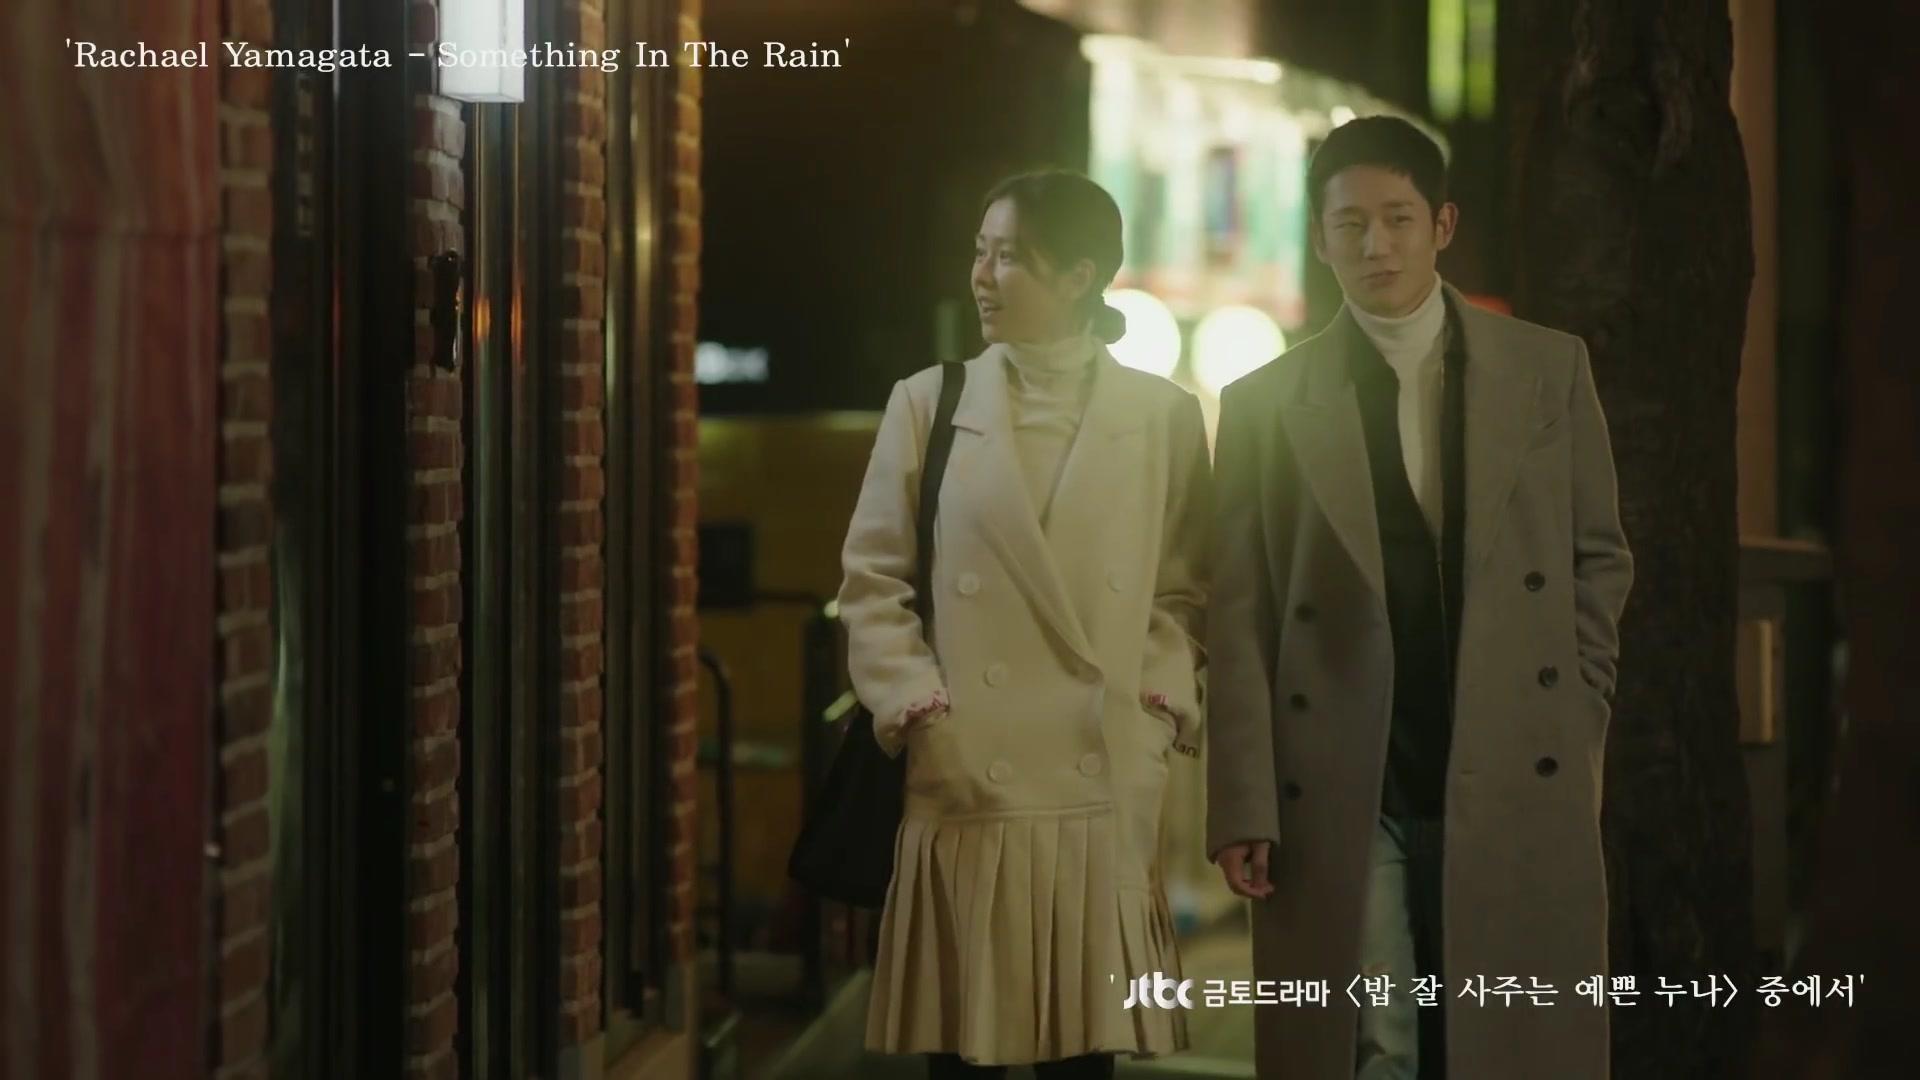 Something In The Rain - Rachael Yamagata